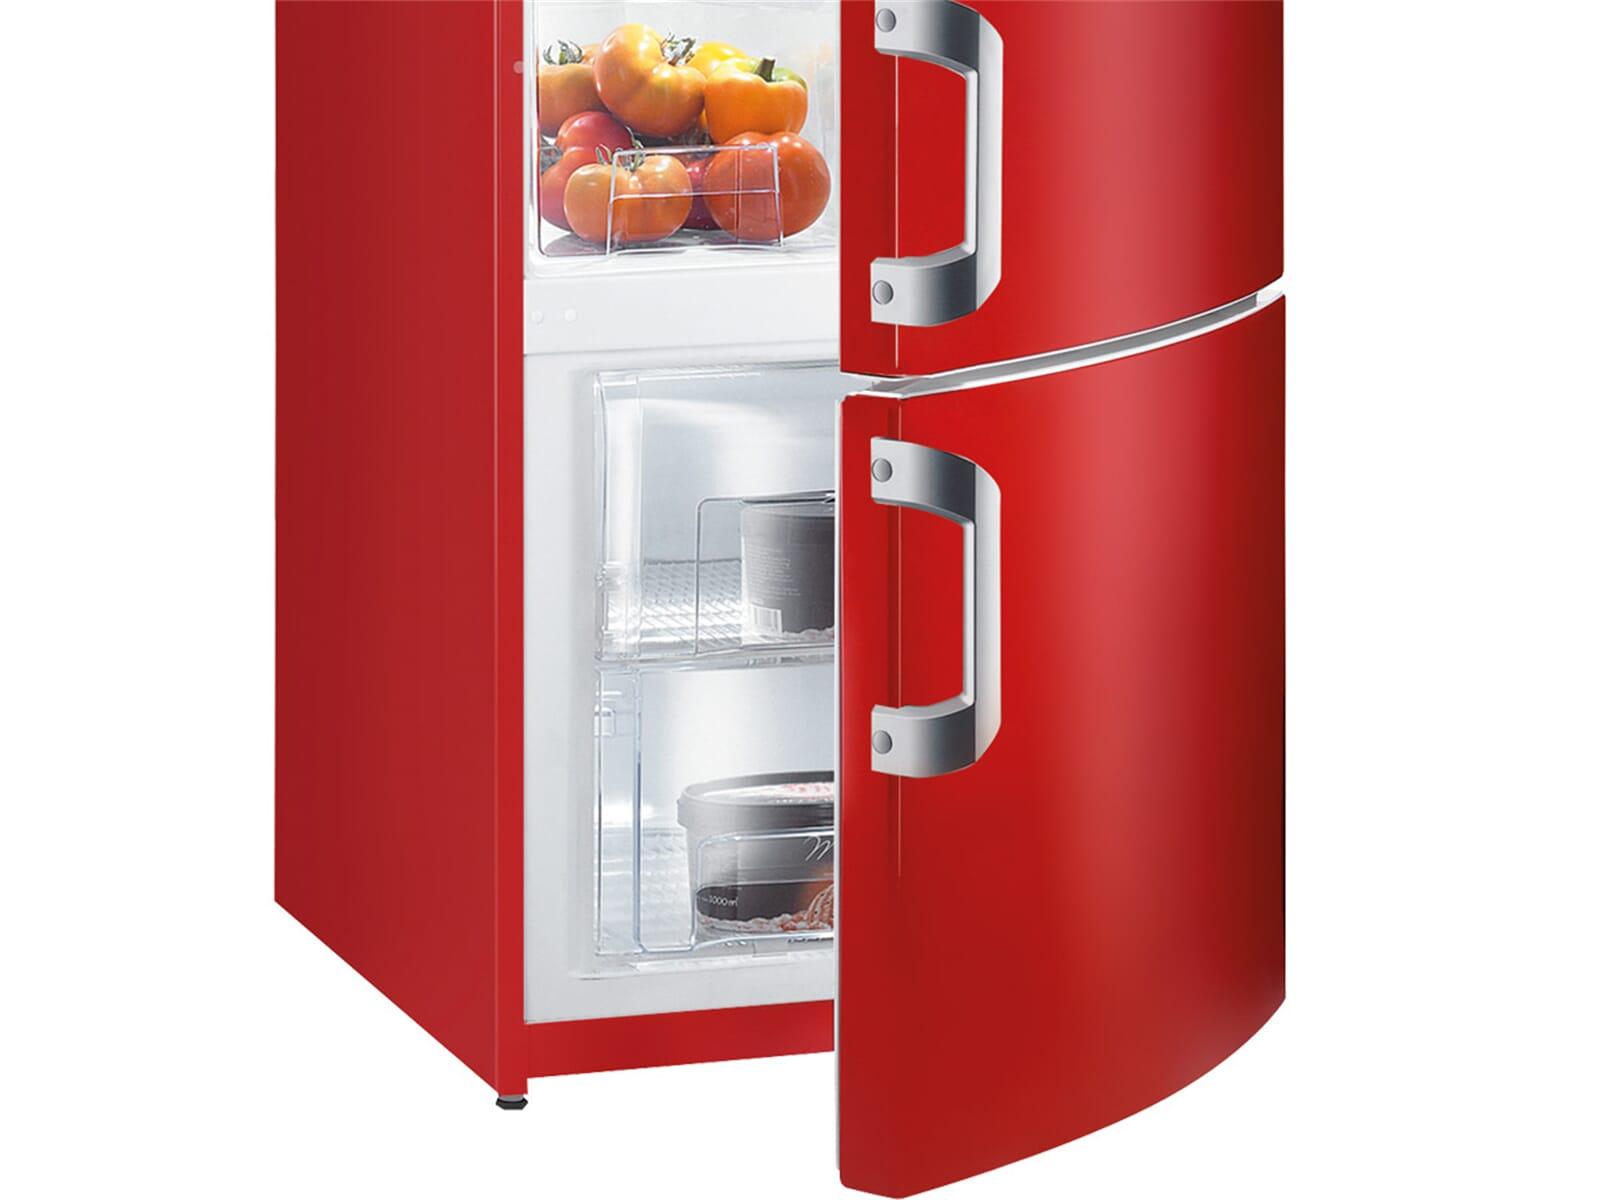 Gorenje Kühlschrank Vw Bulli : Gorenje kühlschrank gefrierkombination gorenje onrk193c l